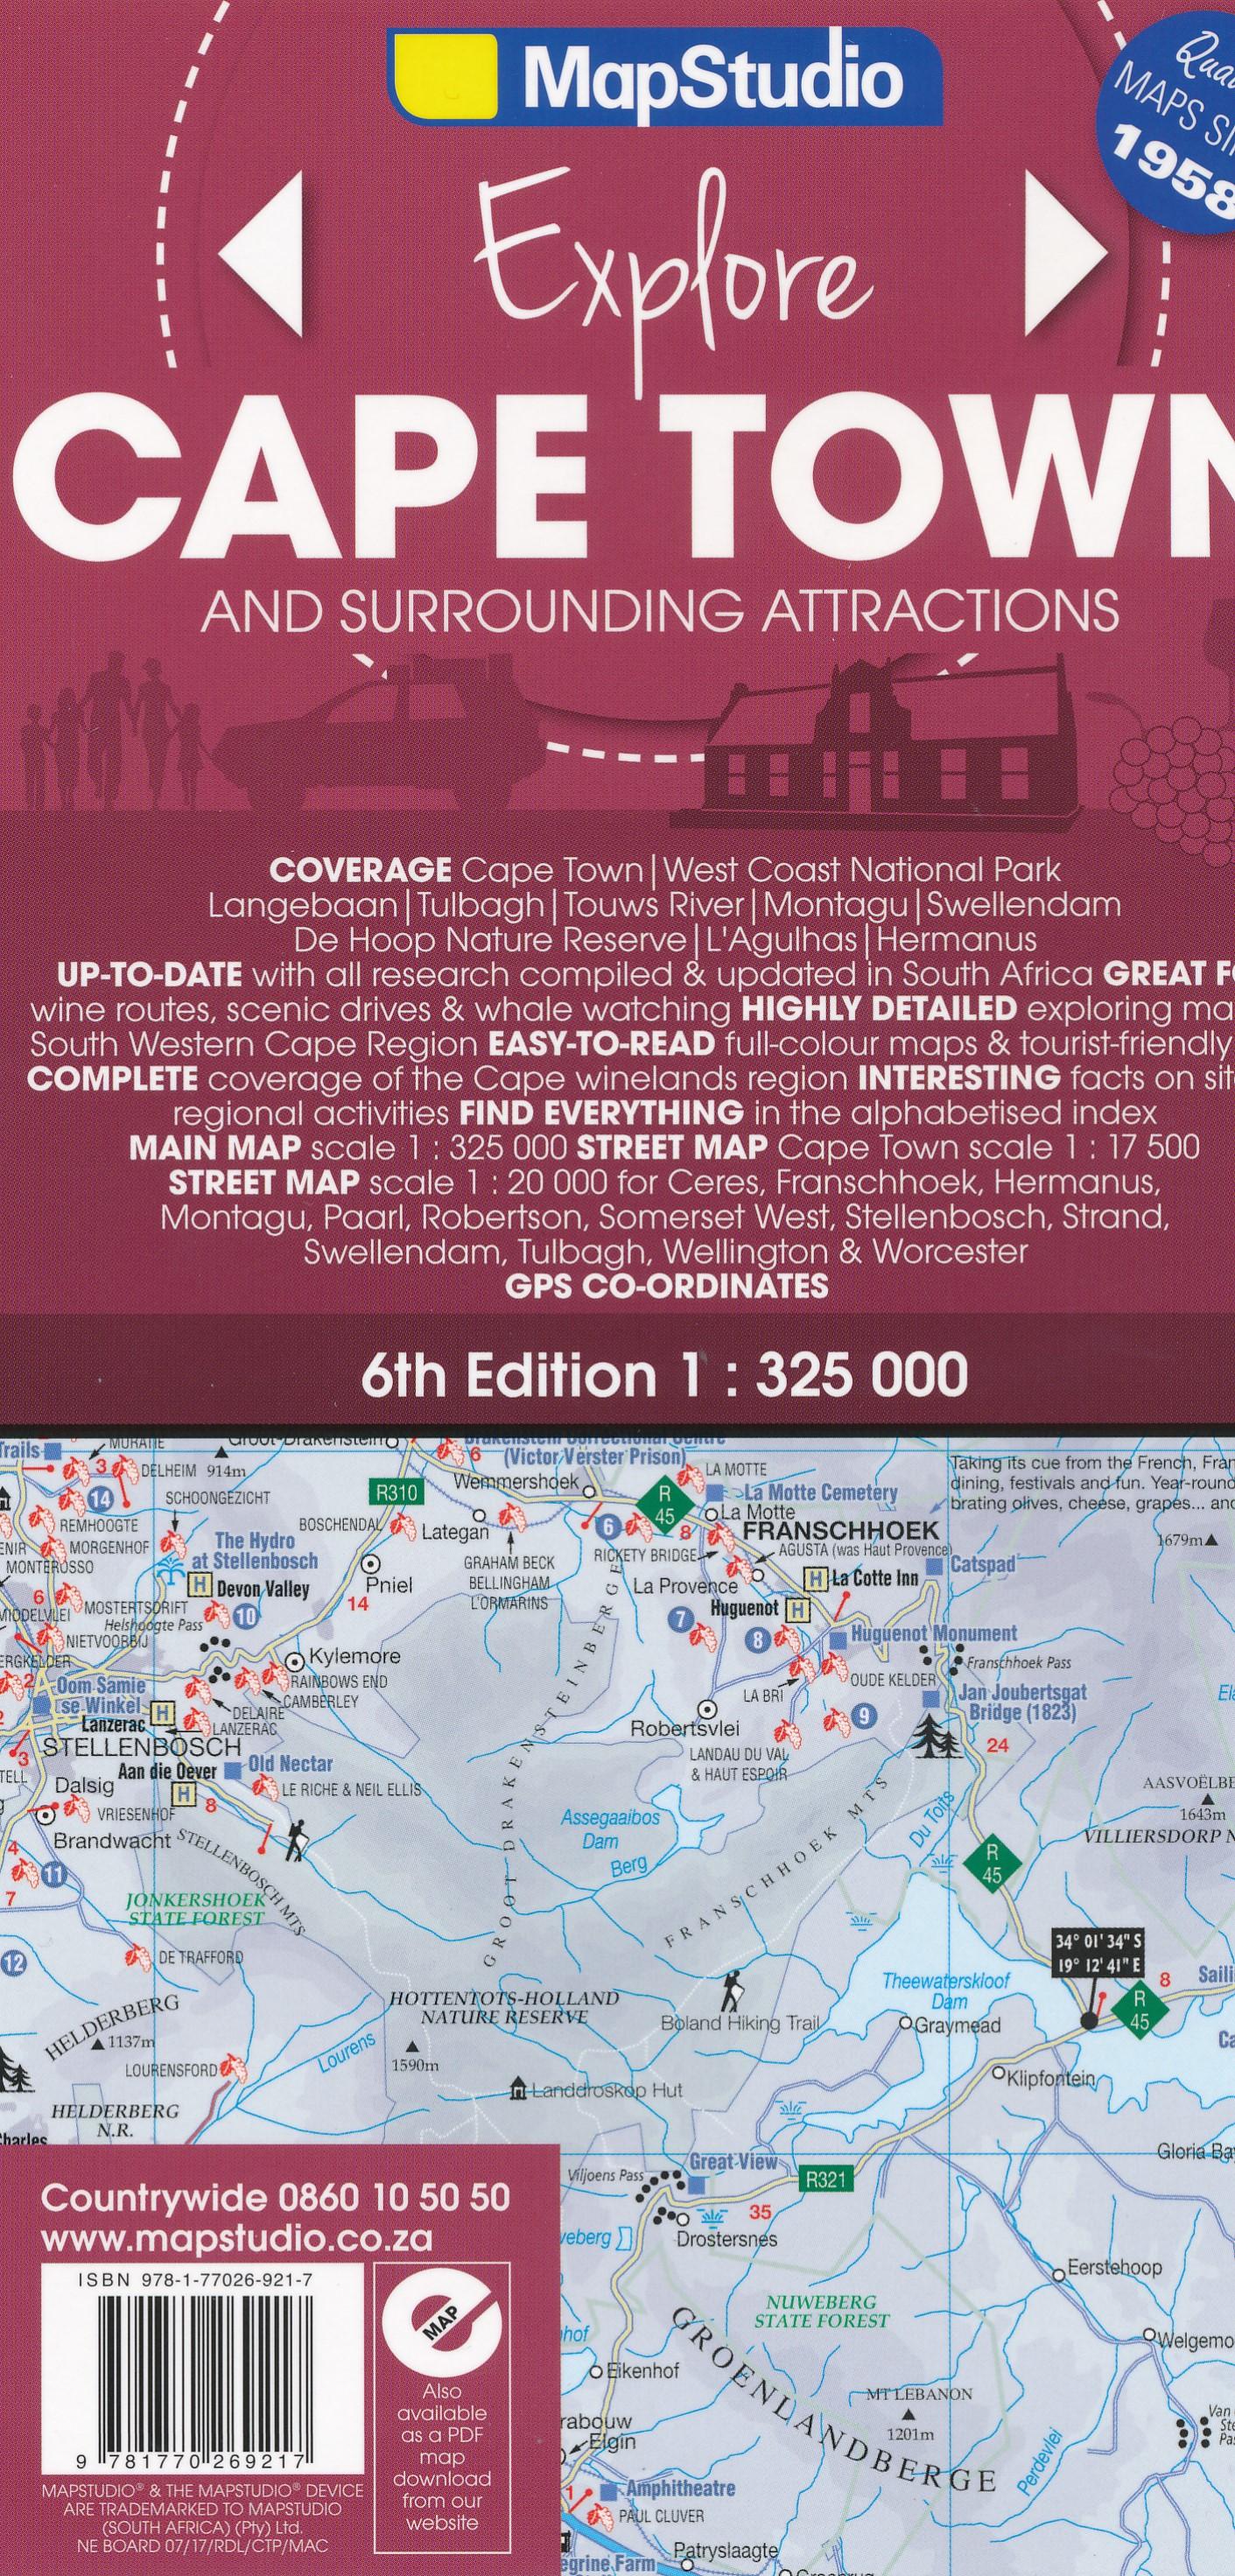 Wegenkaart - landkaart 01 Kaapstad - Cape Town and Surrounding Attractions | MapStudio